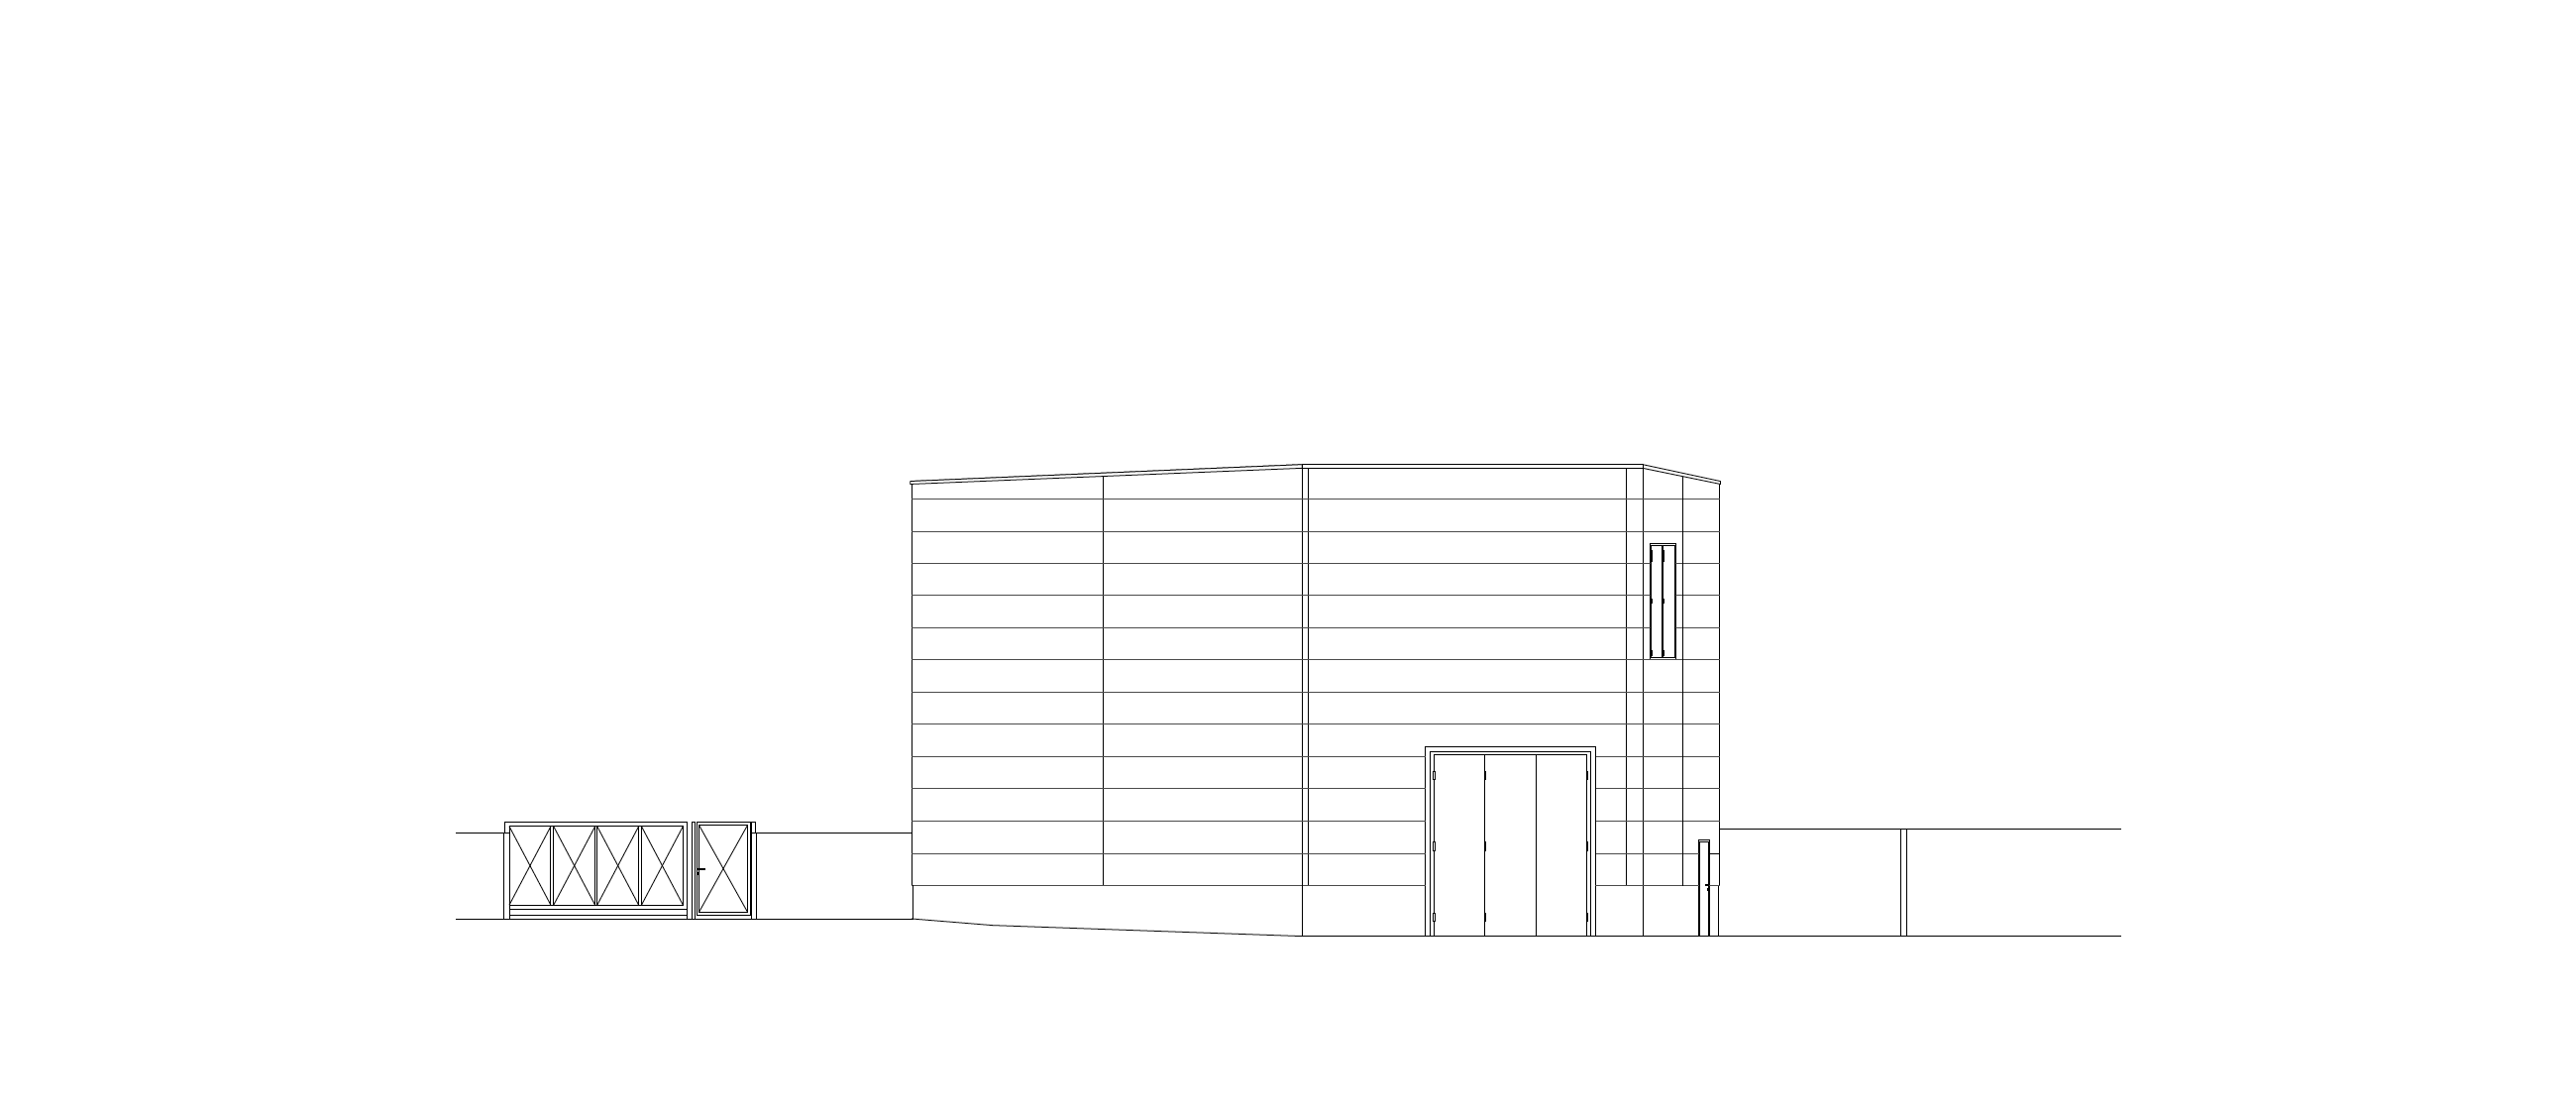 Magazin Tanja Lincke Architekten